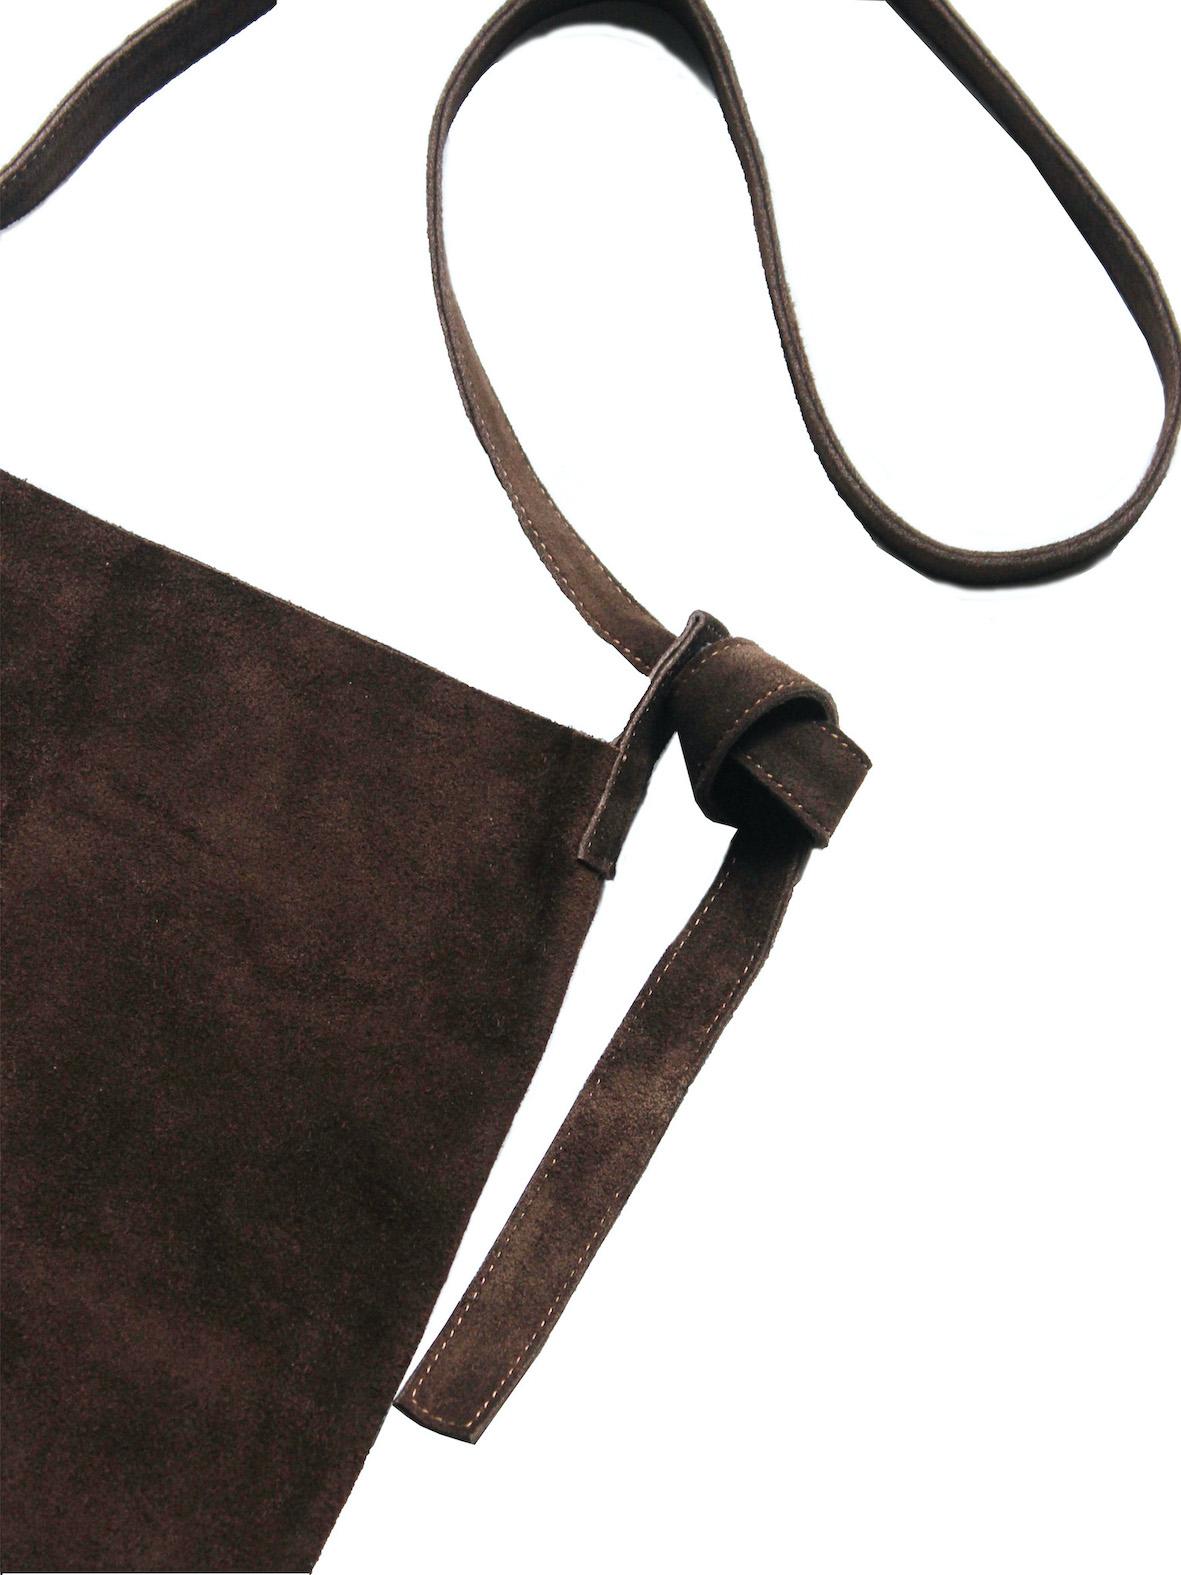 stanyan / mini leather sacoche